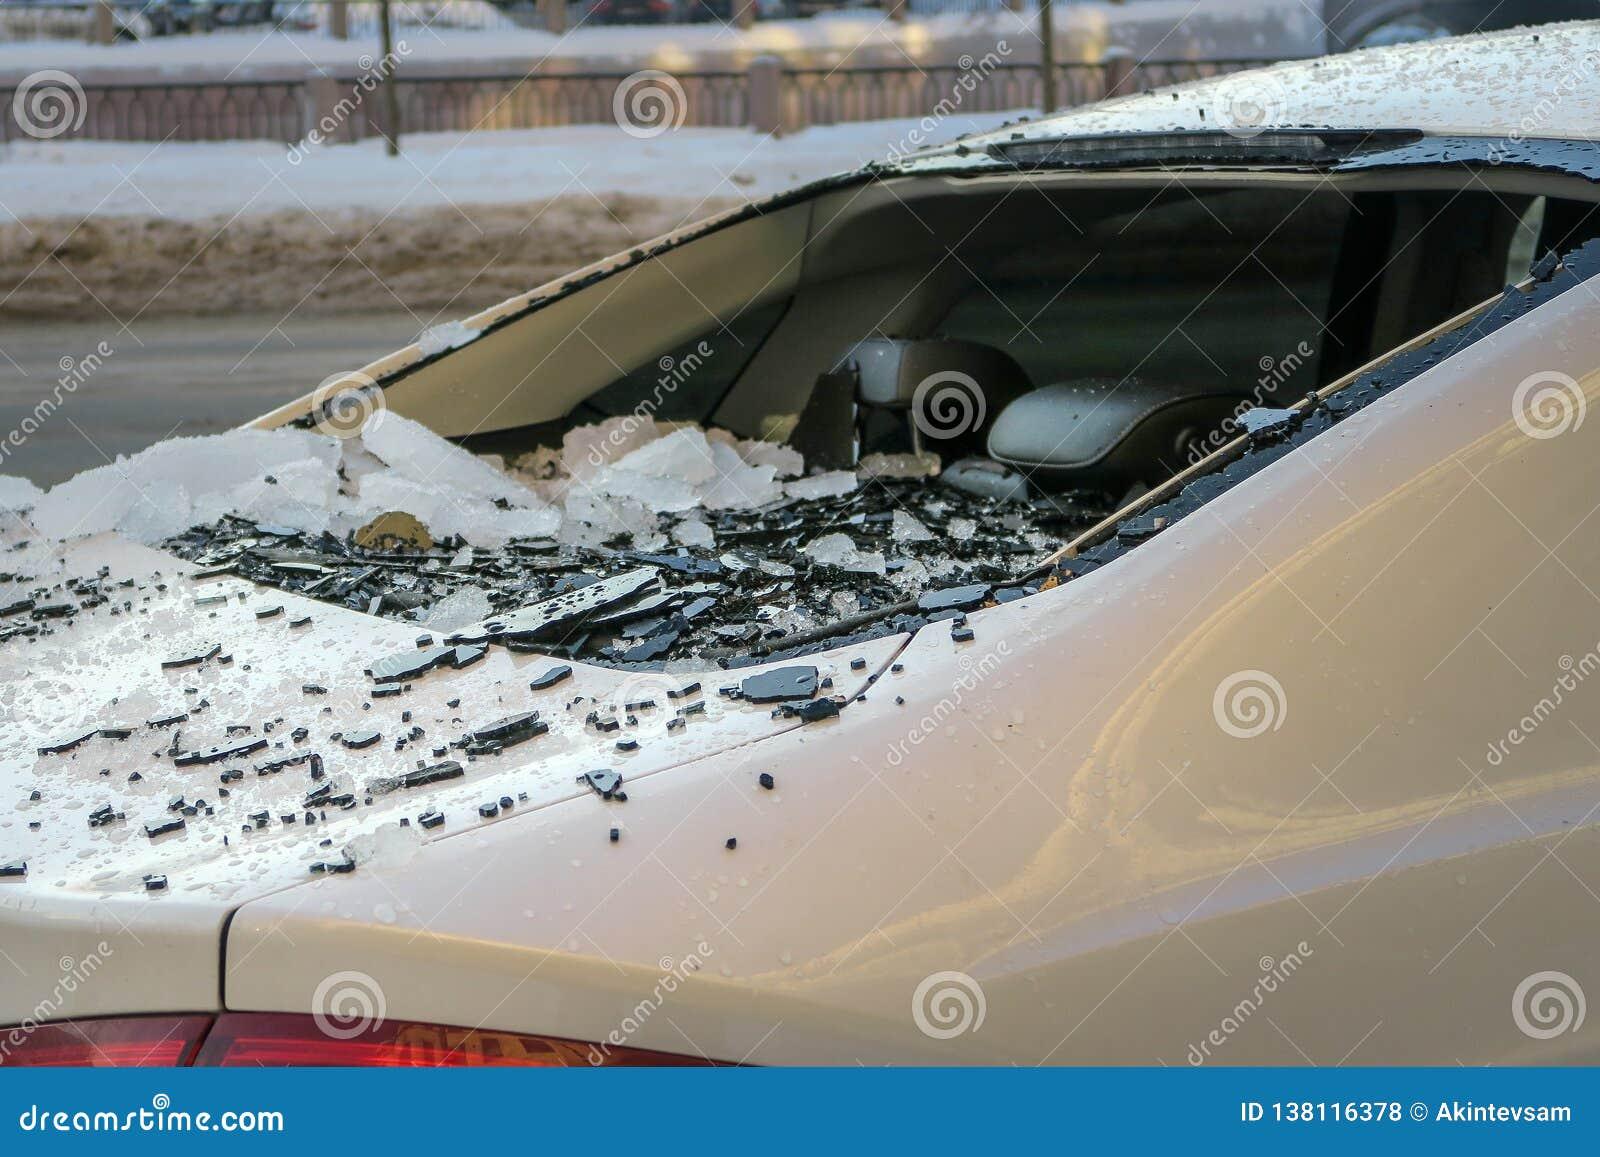 Broken car window. damaged car from falling ice